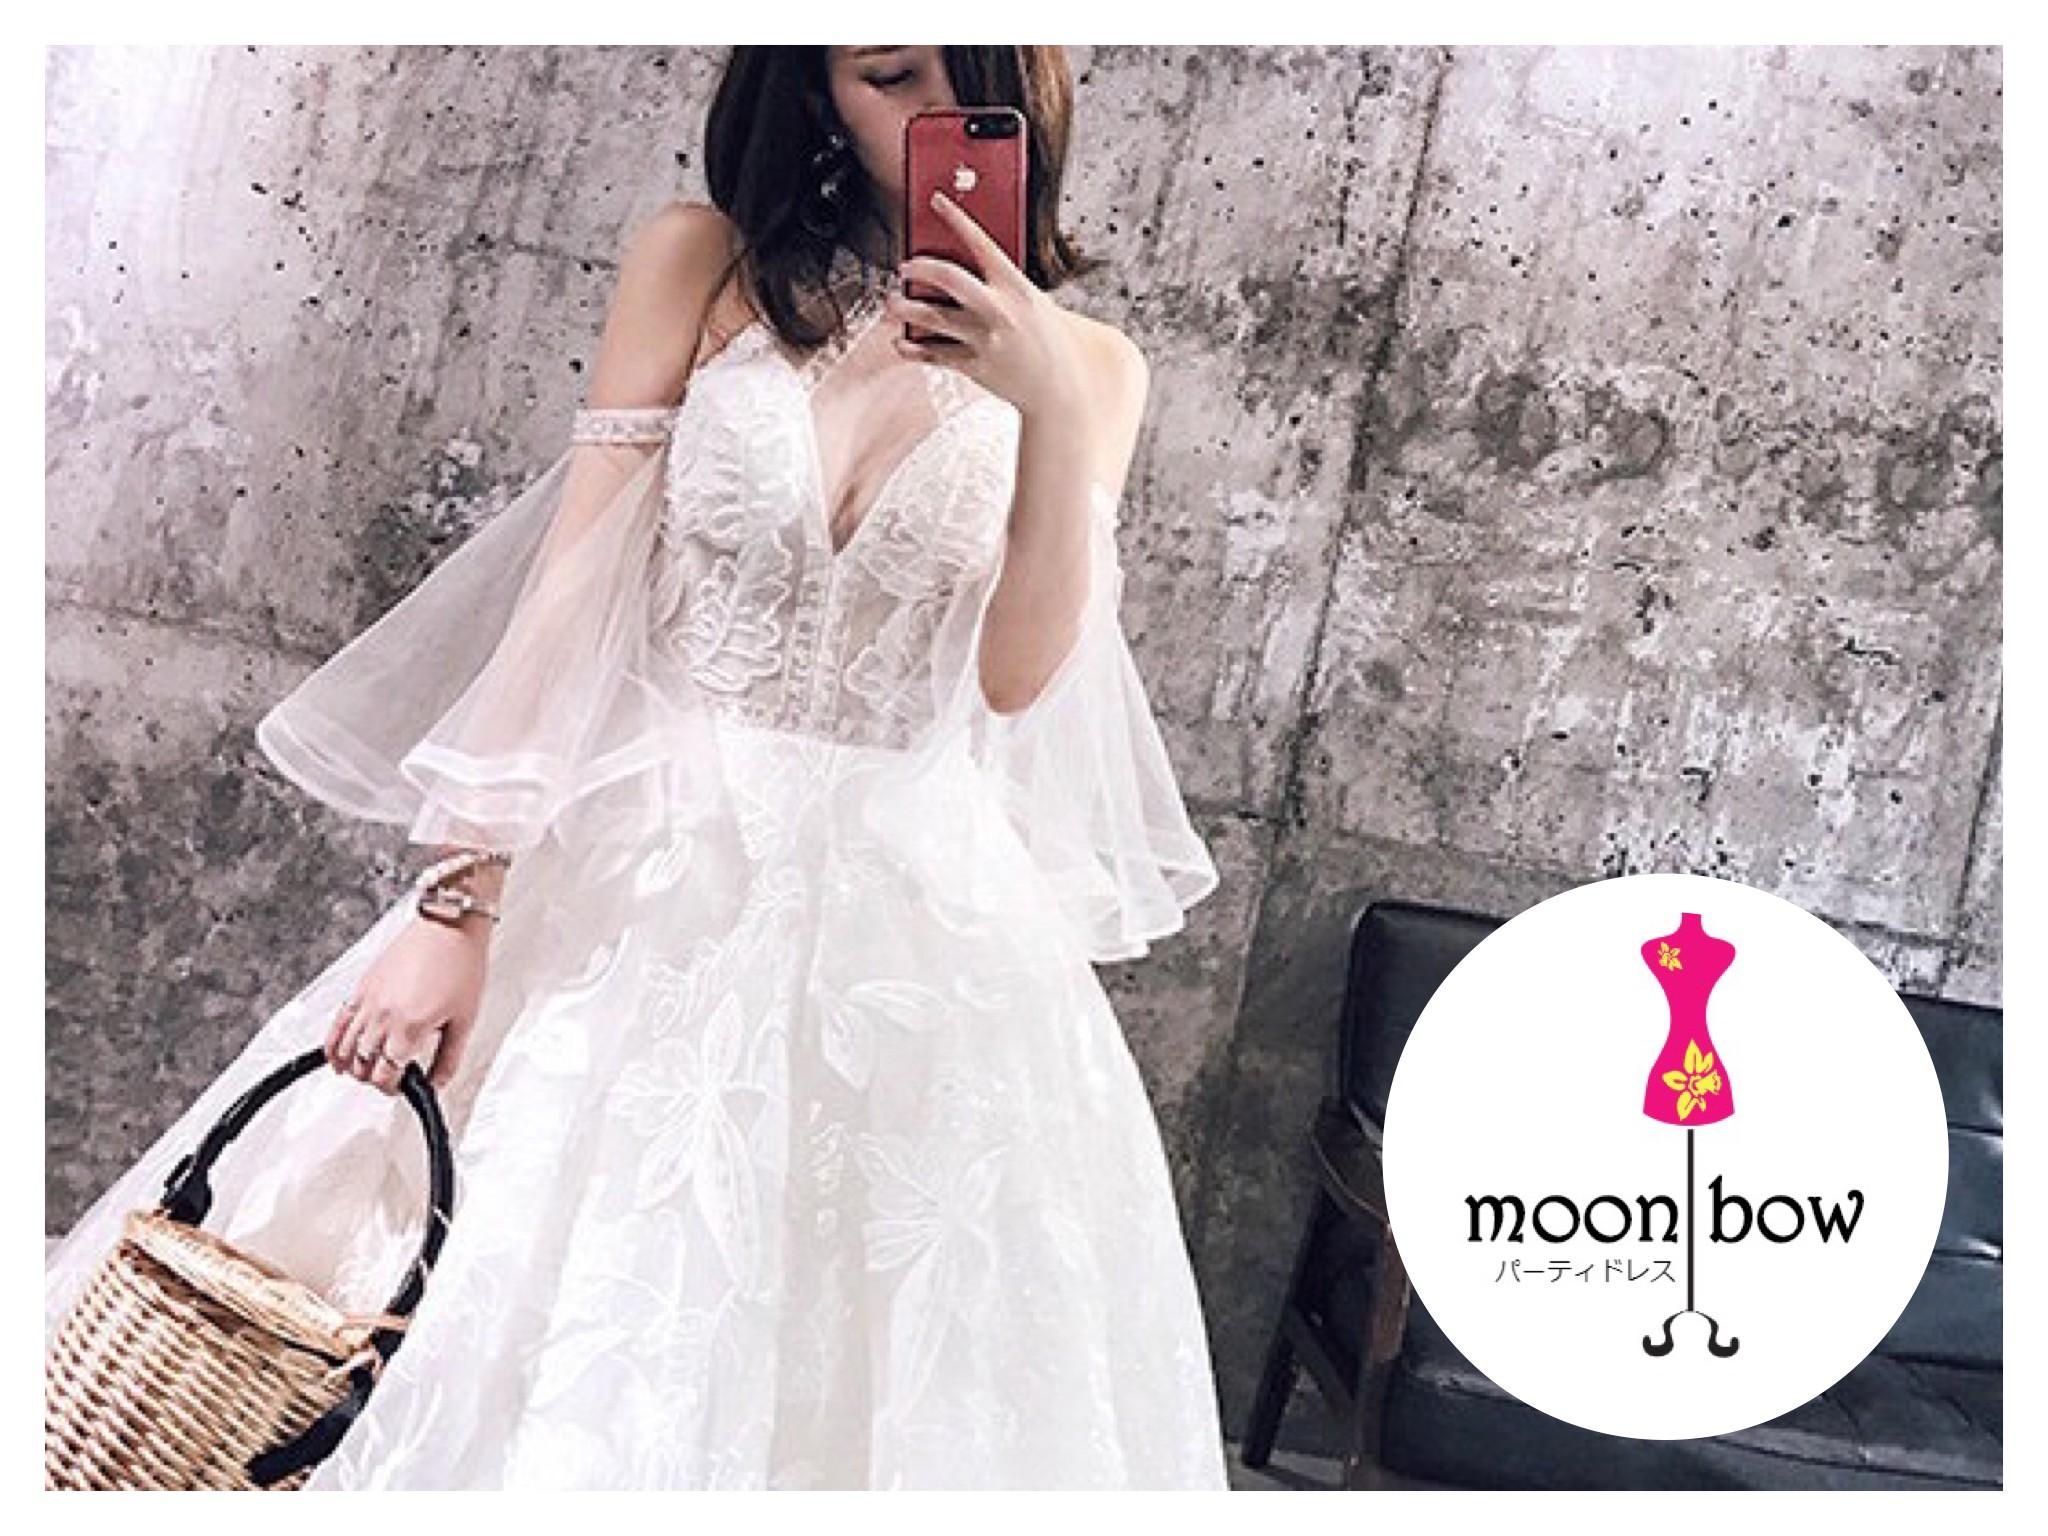 moonbow dress